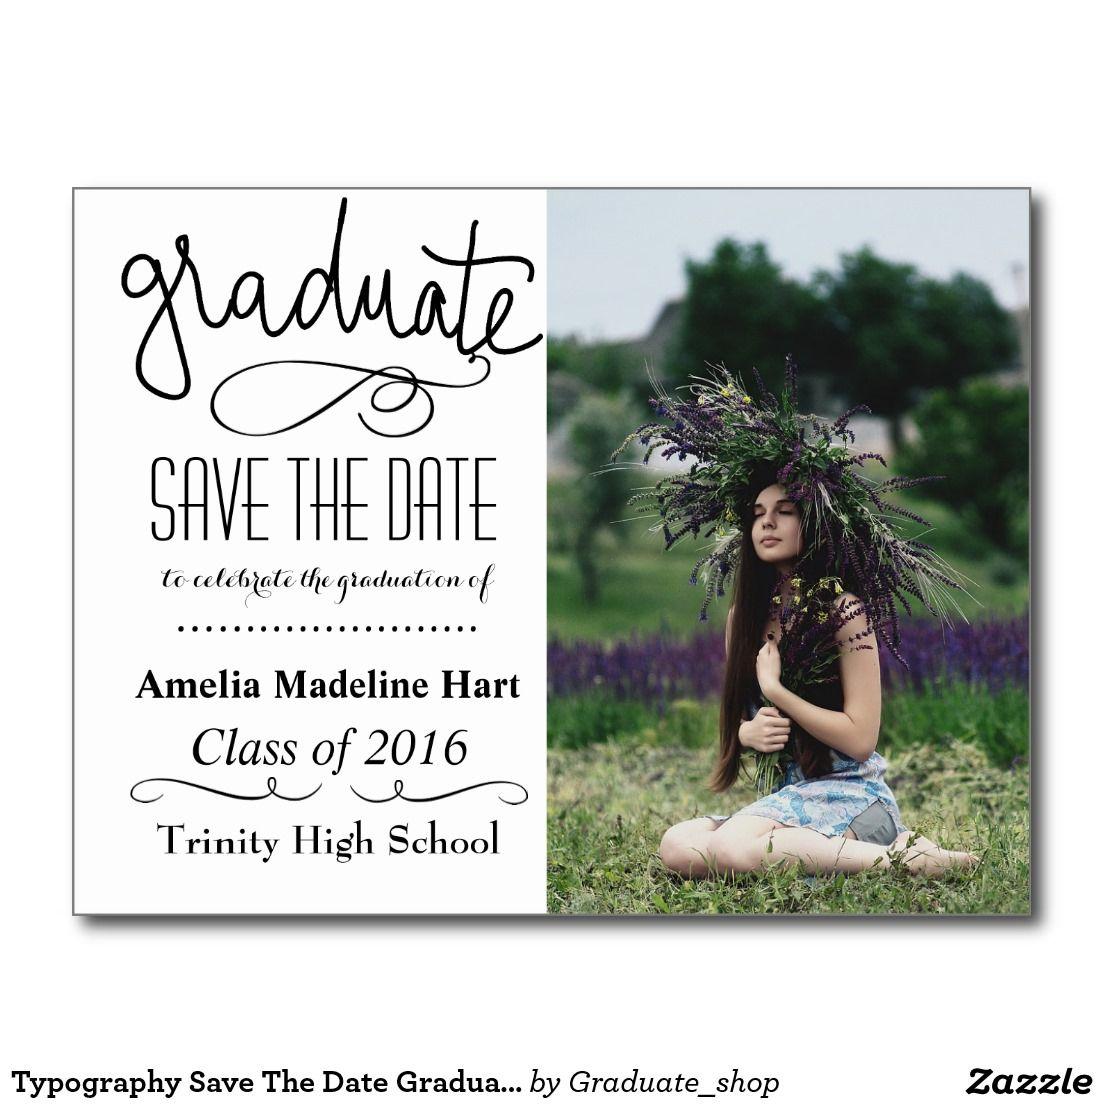 Typography Save The Date Graduation Party Photo Announcement Postcard Zazzle Com Photo Graduation Invitations Graduation Party Graduation Announcements